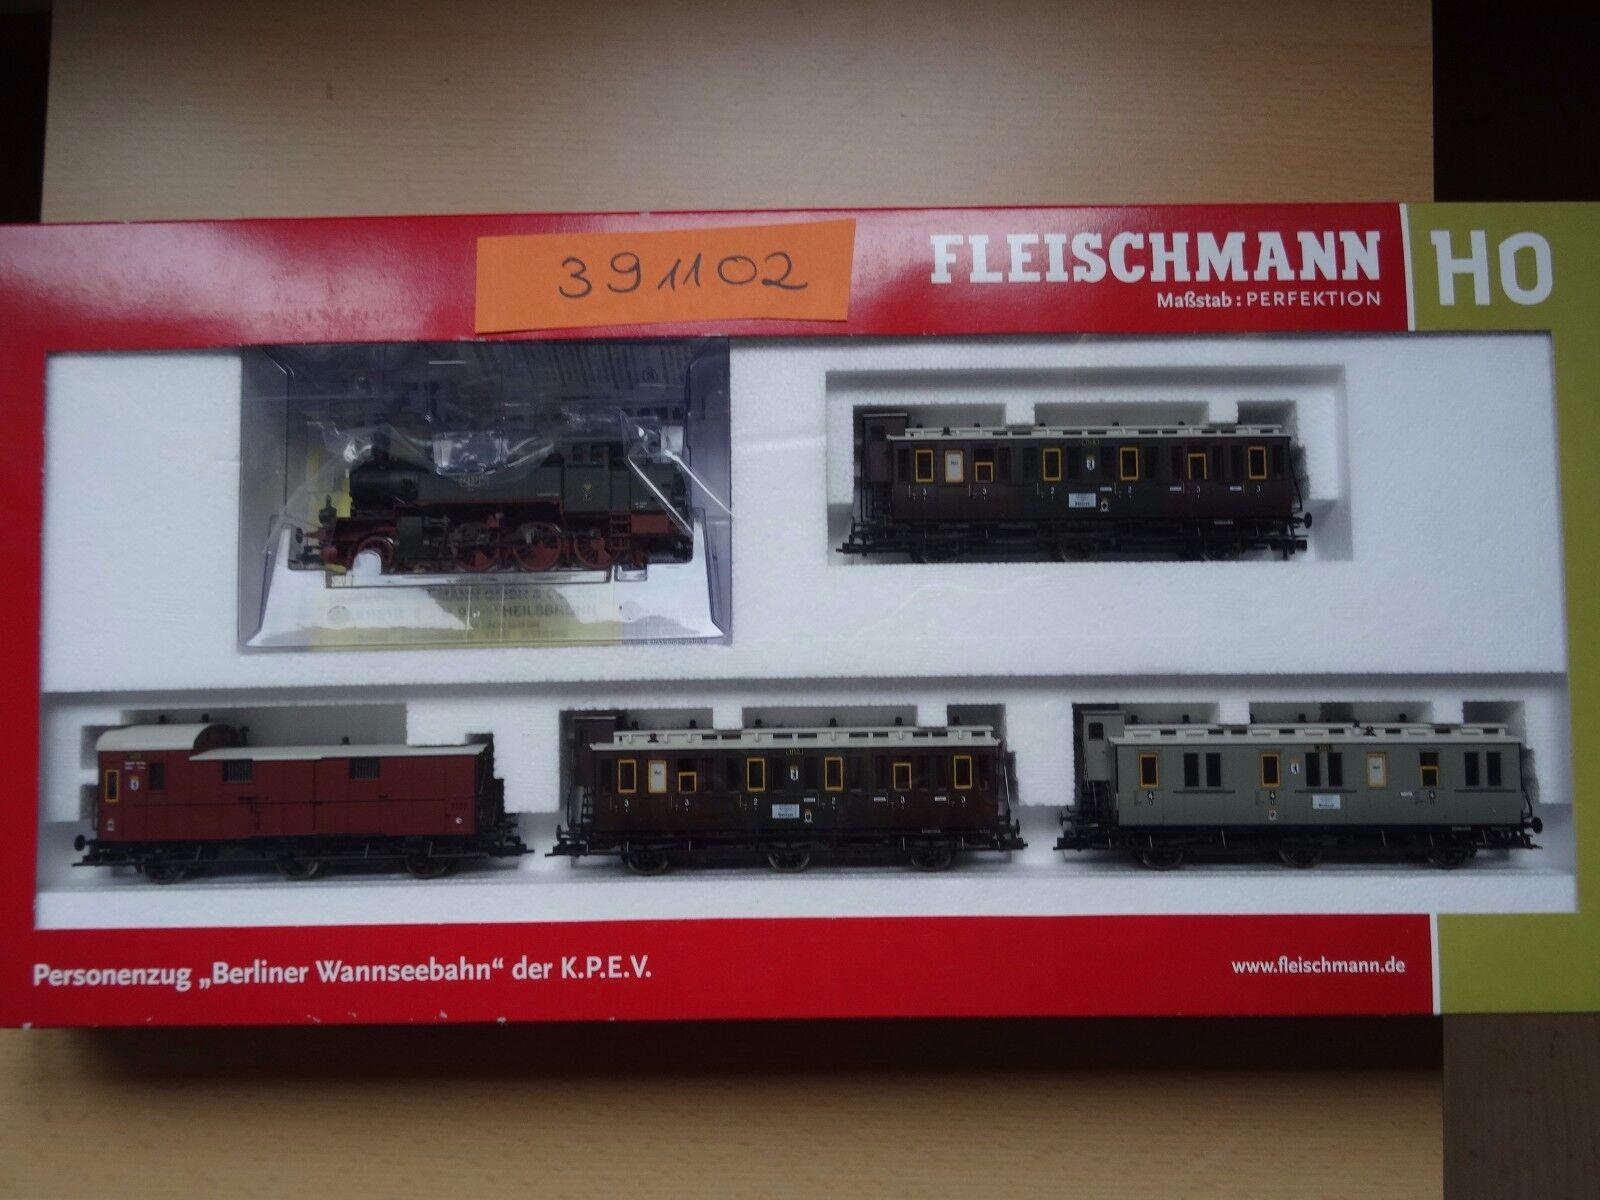 Fleischmann HO HO HO art 391102 so-serie  di Berlino Wannsee ferroviario  AC, DIG-Merce Nuova dd59f4